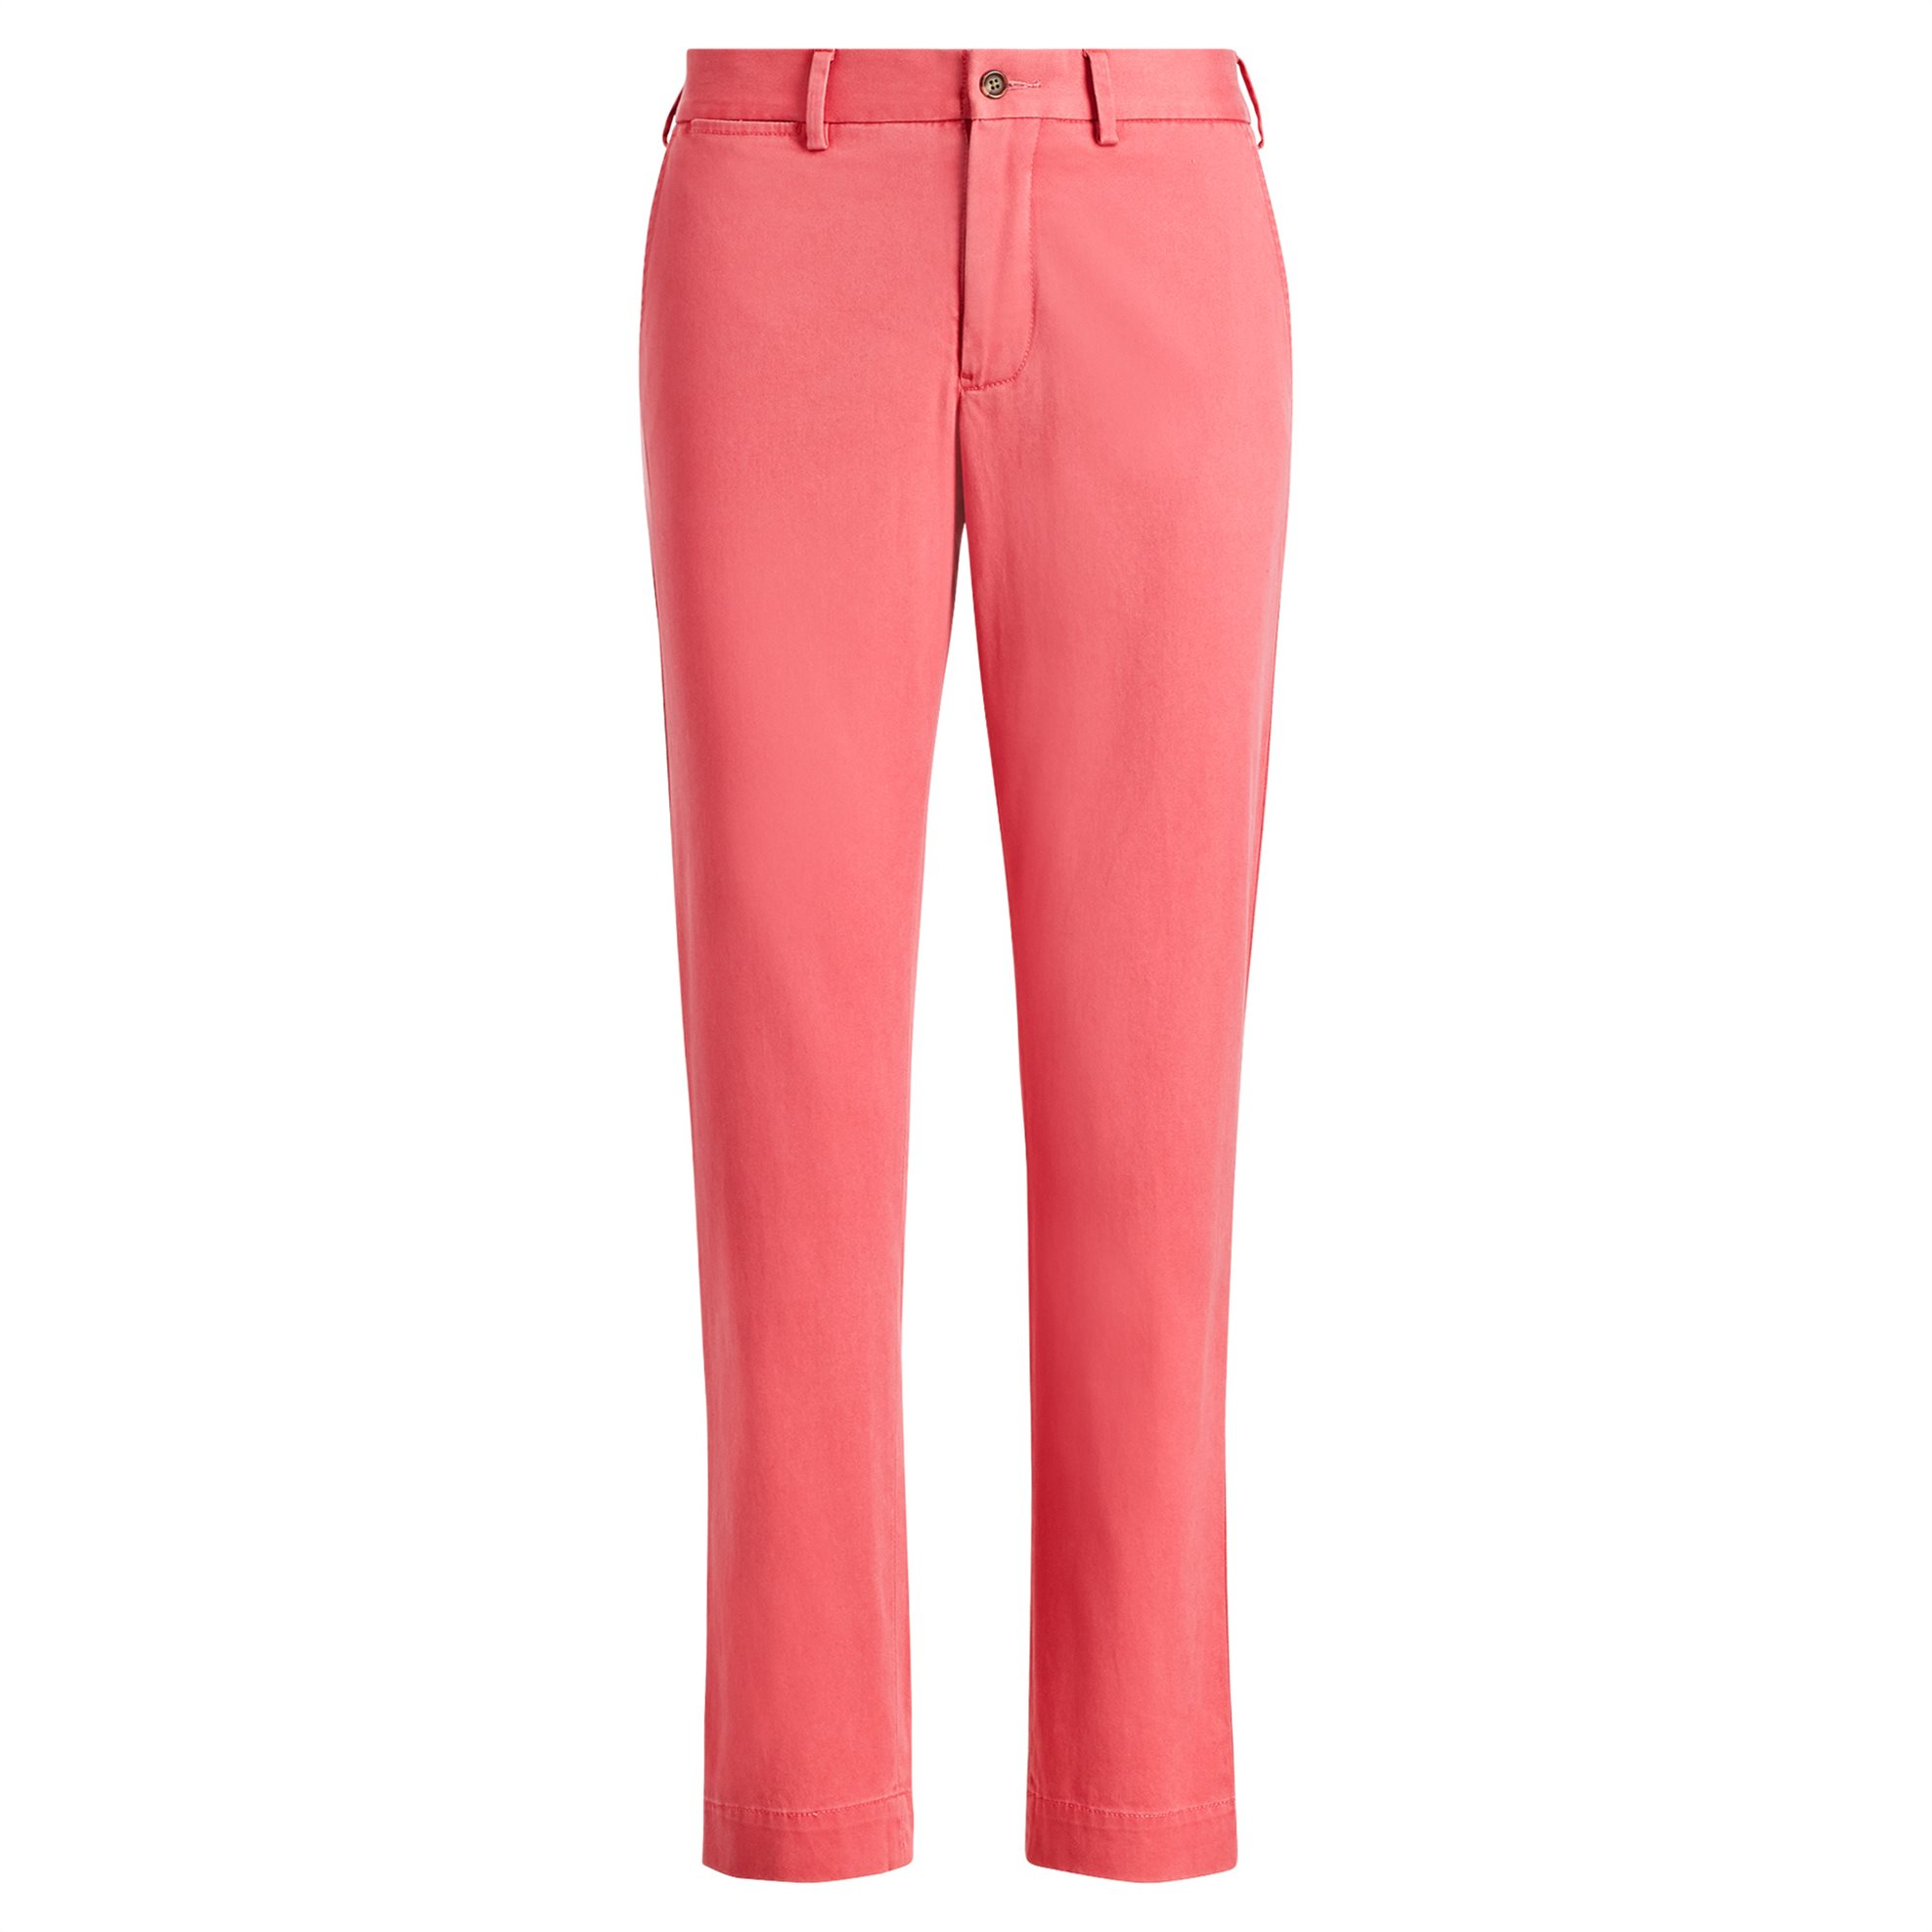 Polo Ralph Lauren γυναικείο παντελόνι Stretch Cotton Straight Pant Adirondack Be γυναικα   ρουχα   παντελόνια   ίσια γραμμή